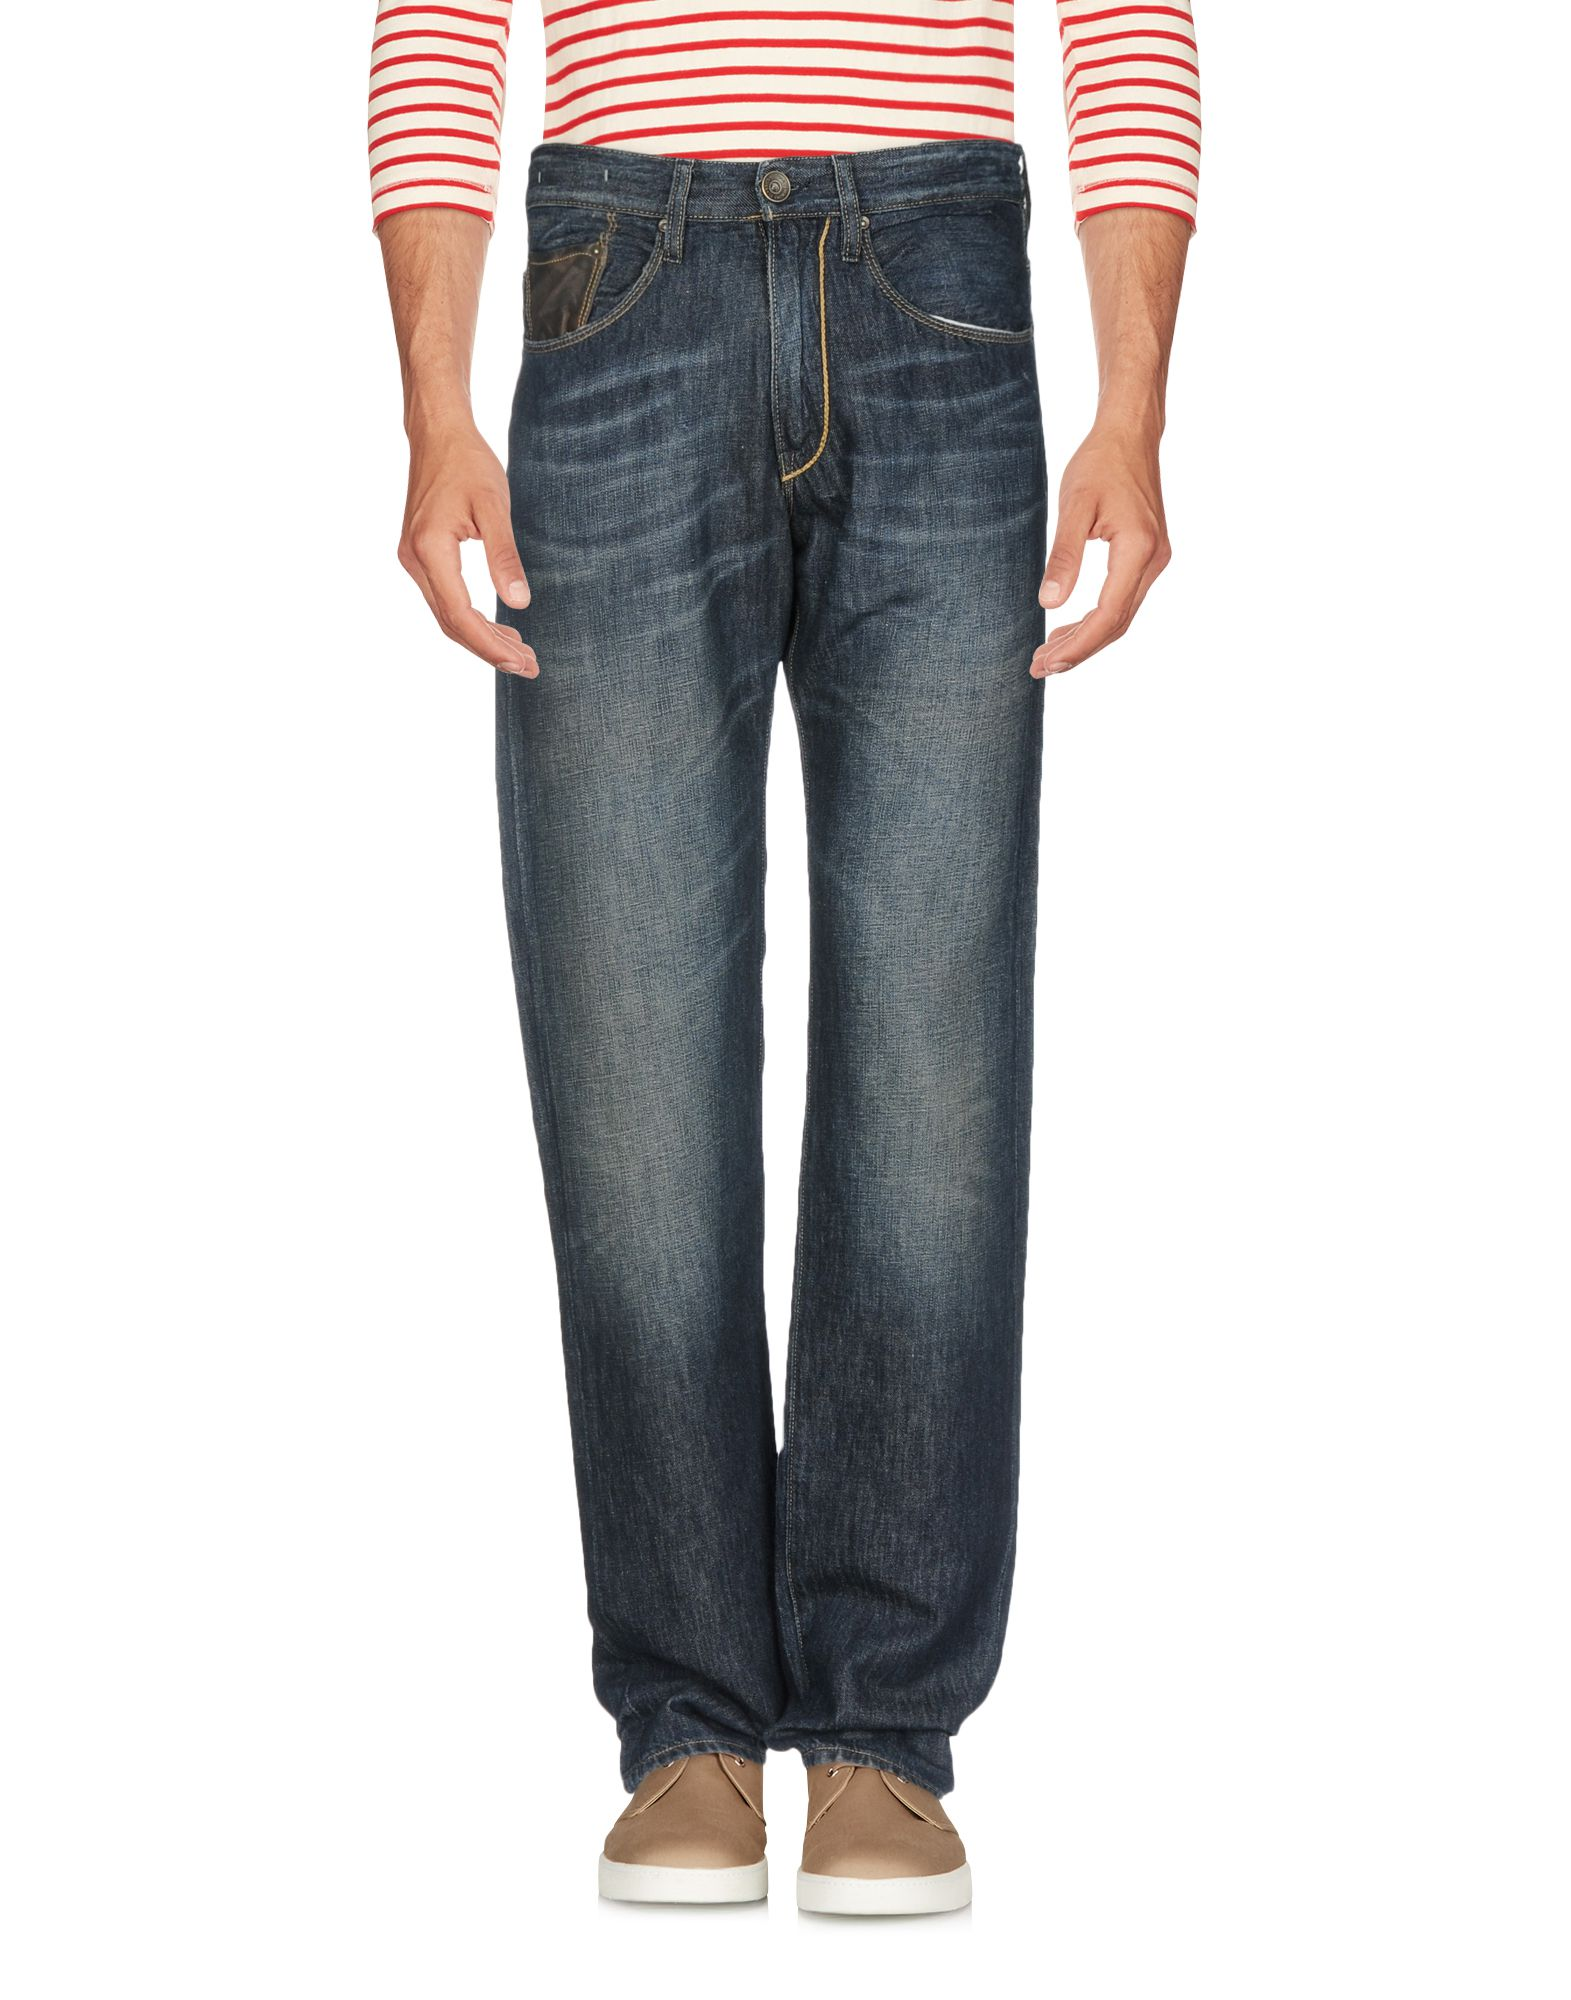 MCS MARLBORO CLASSICS Джинсовые брюки